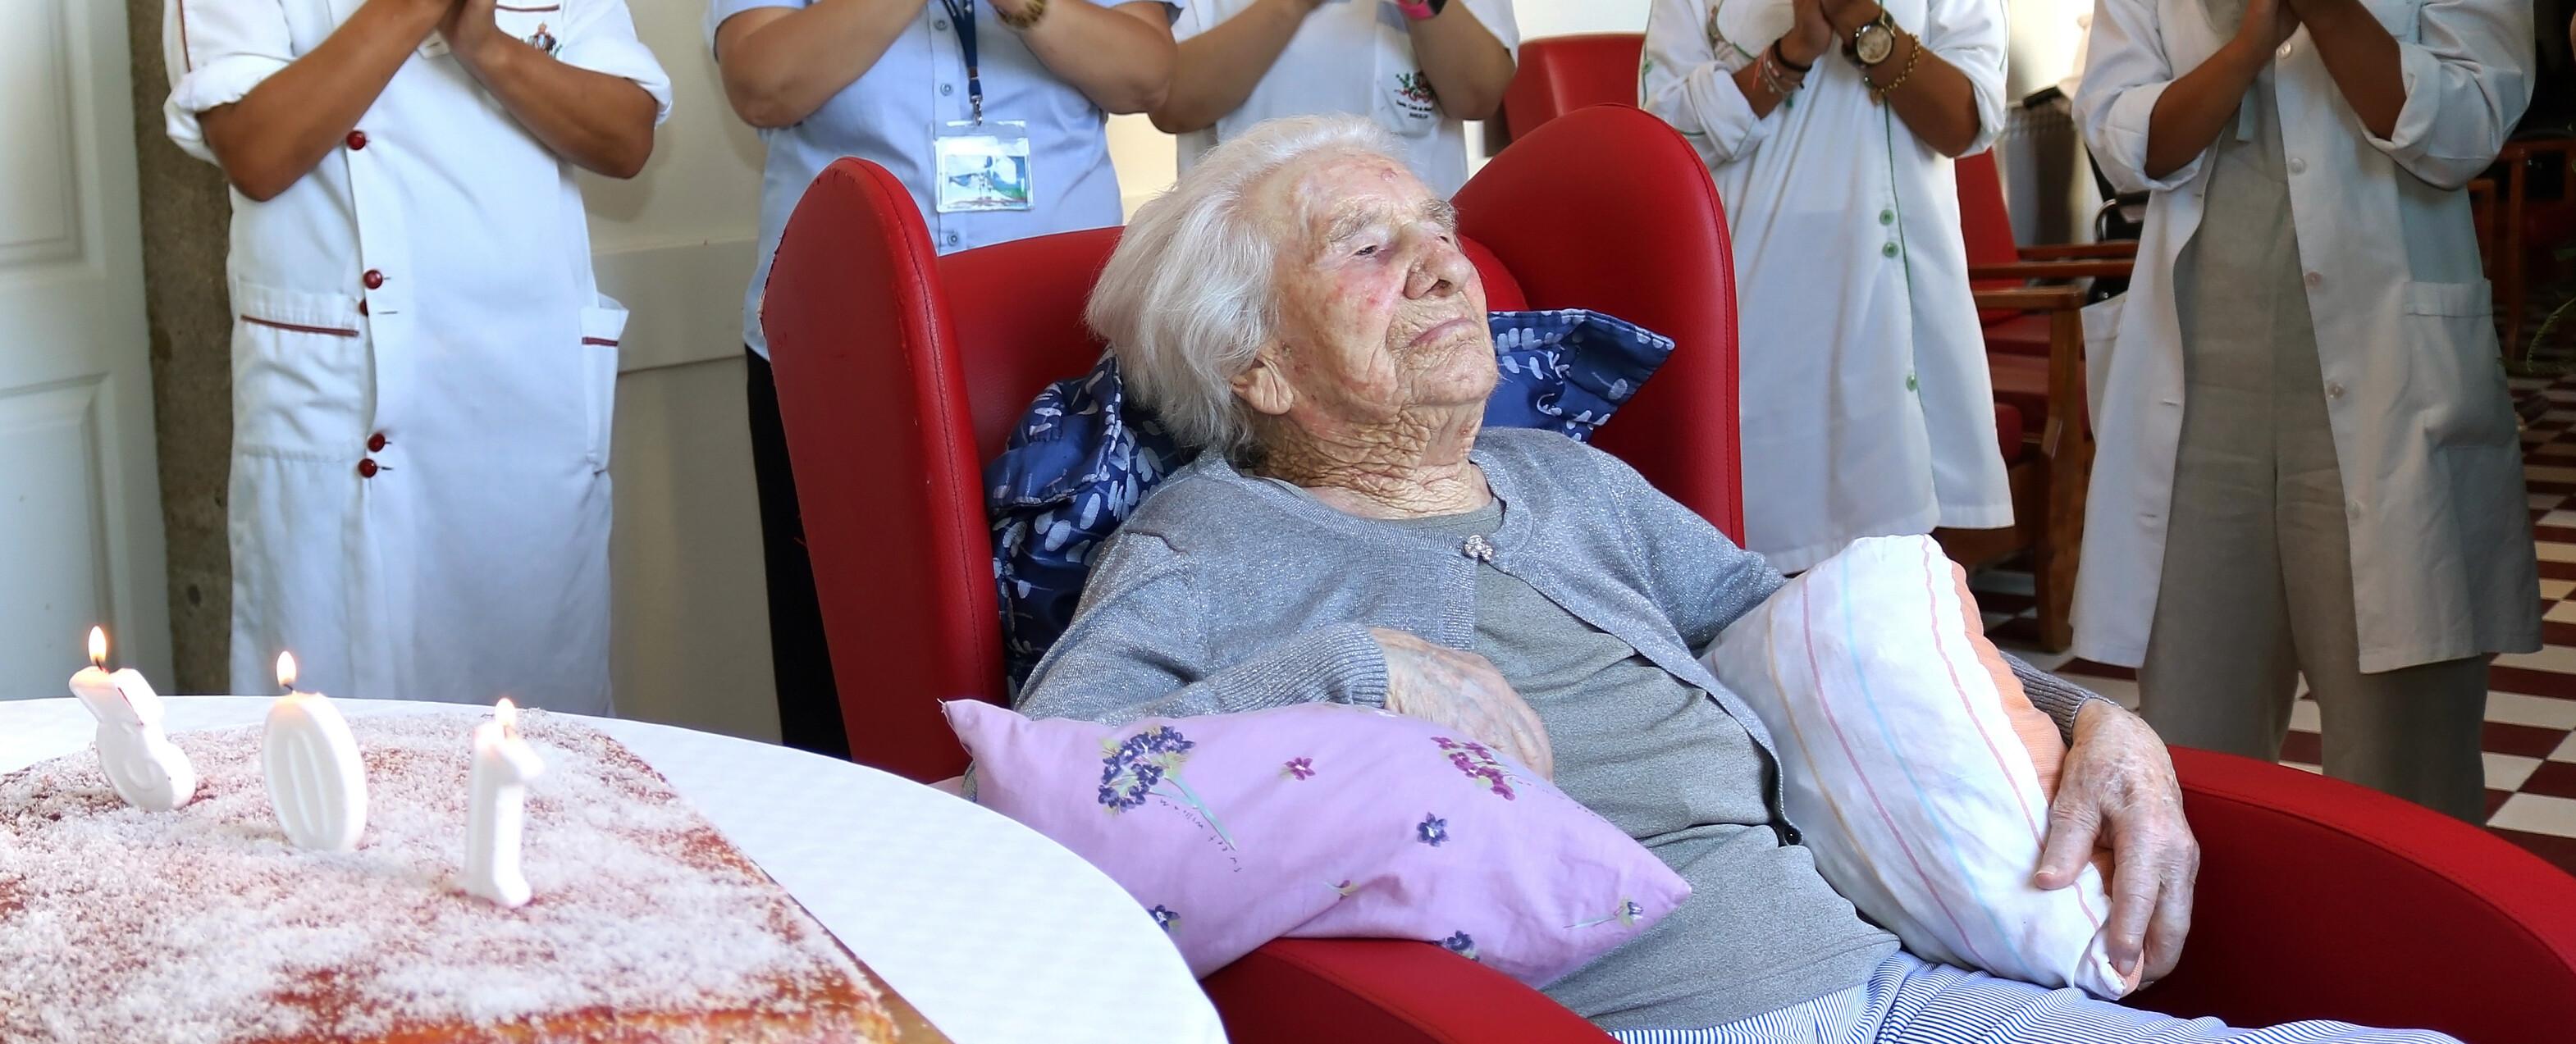 deolinda-leal-celebrou-103-anos-de-vida